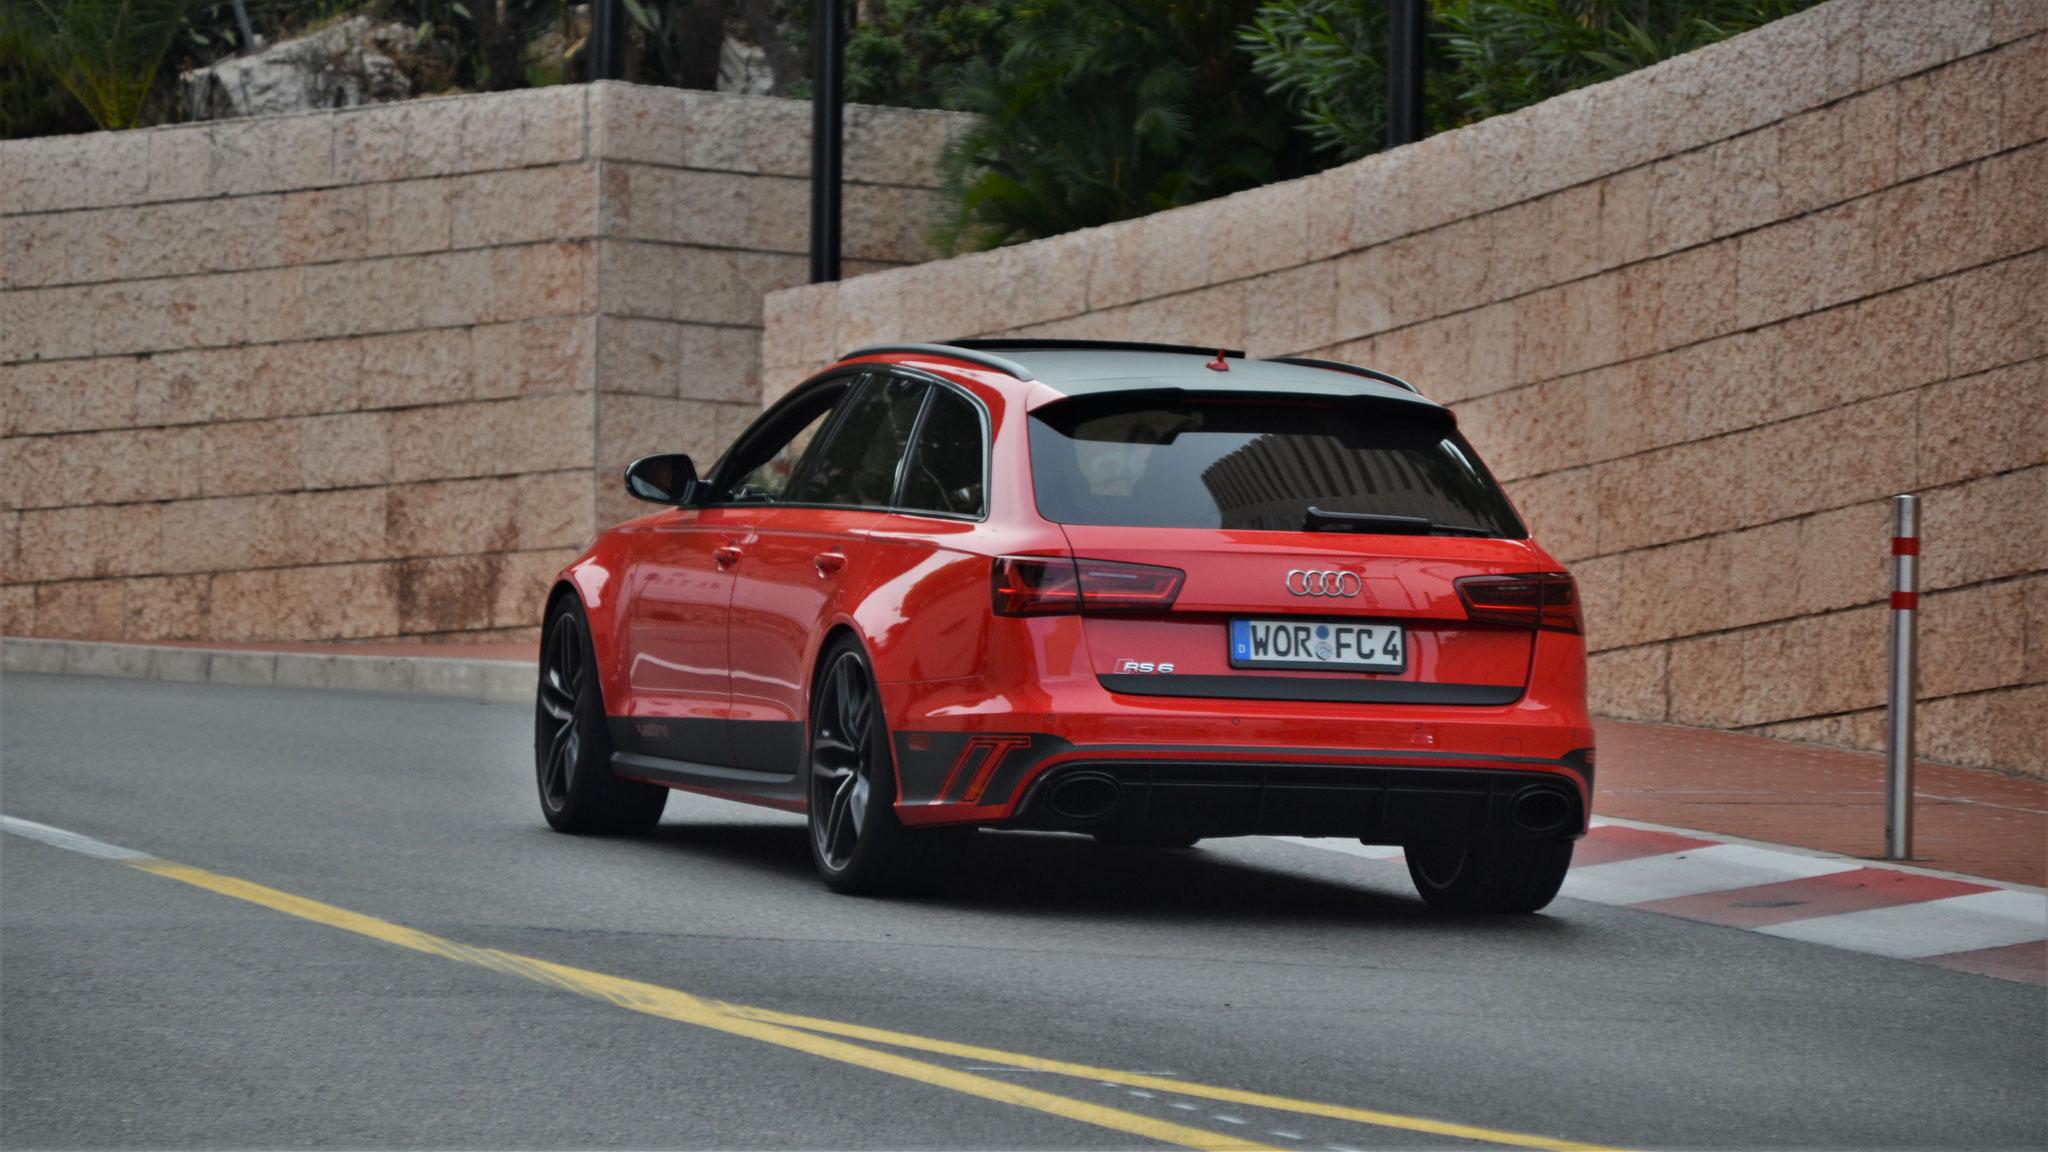 Audi RS6 - WOR-FC-4